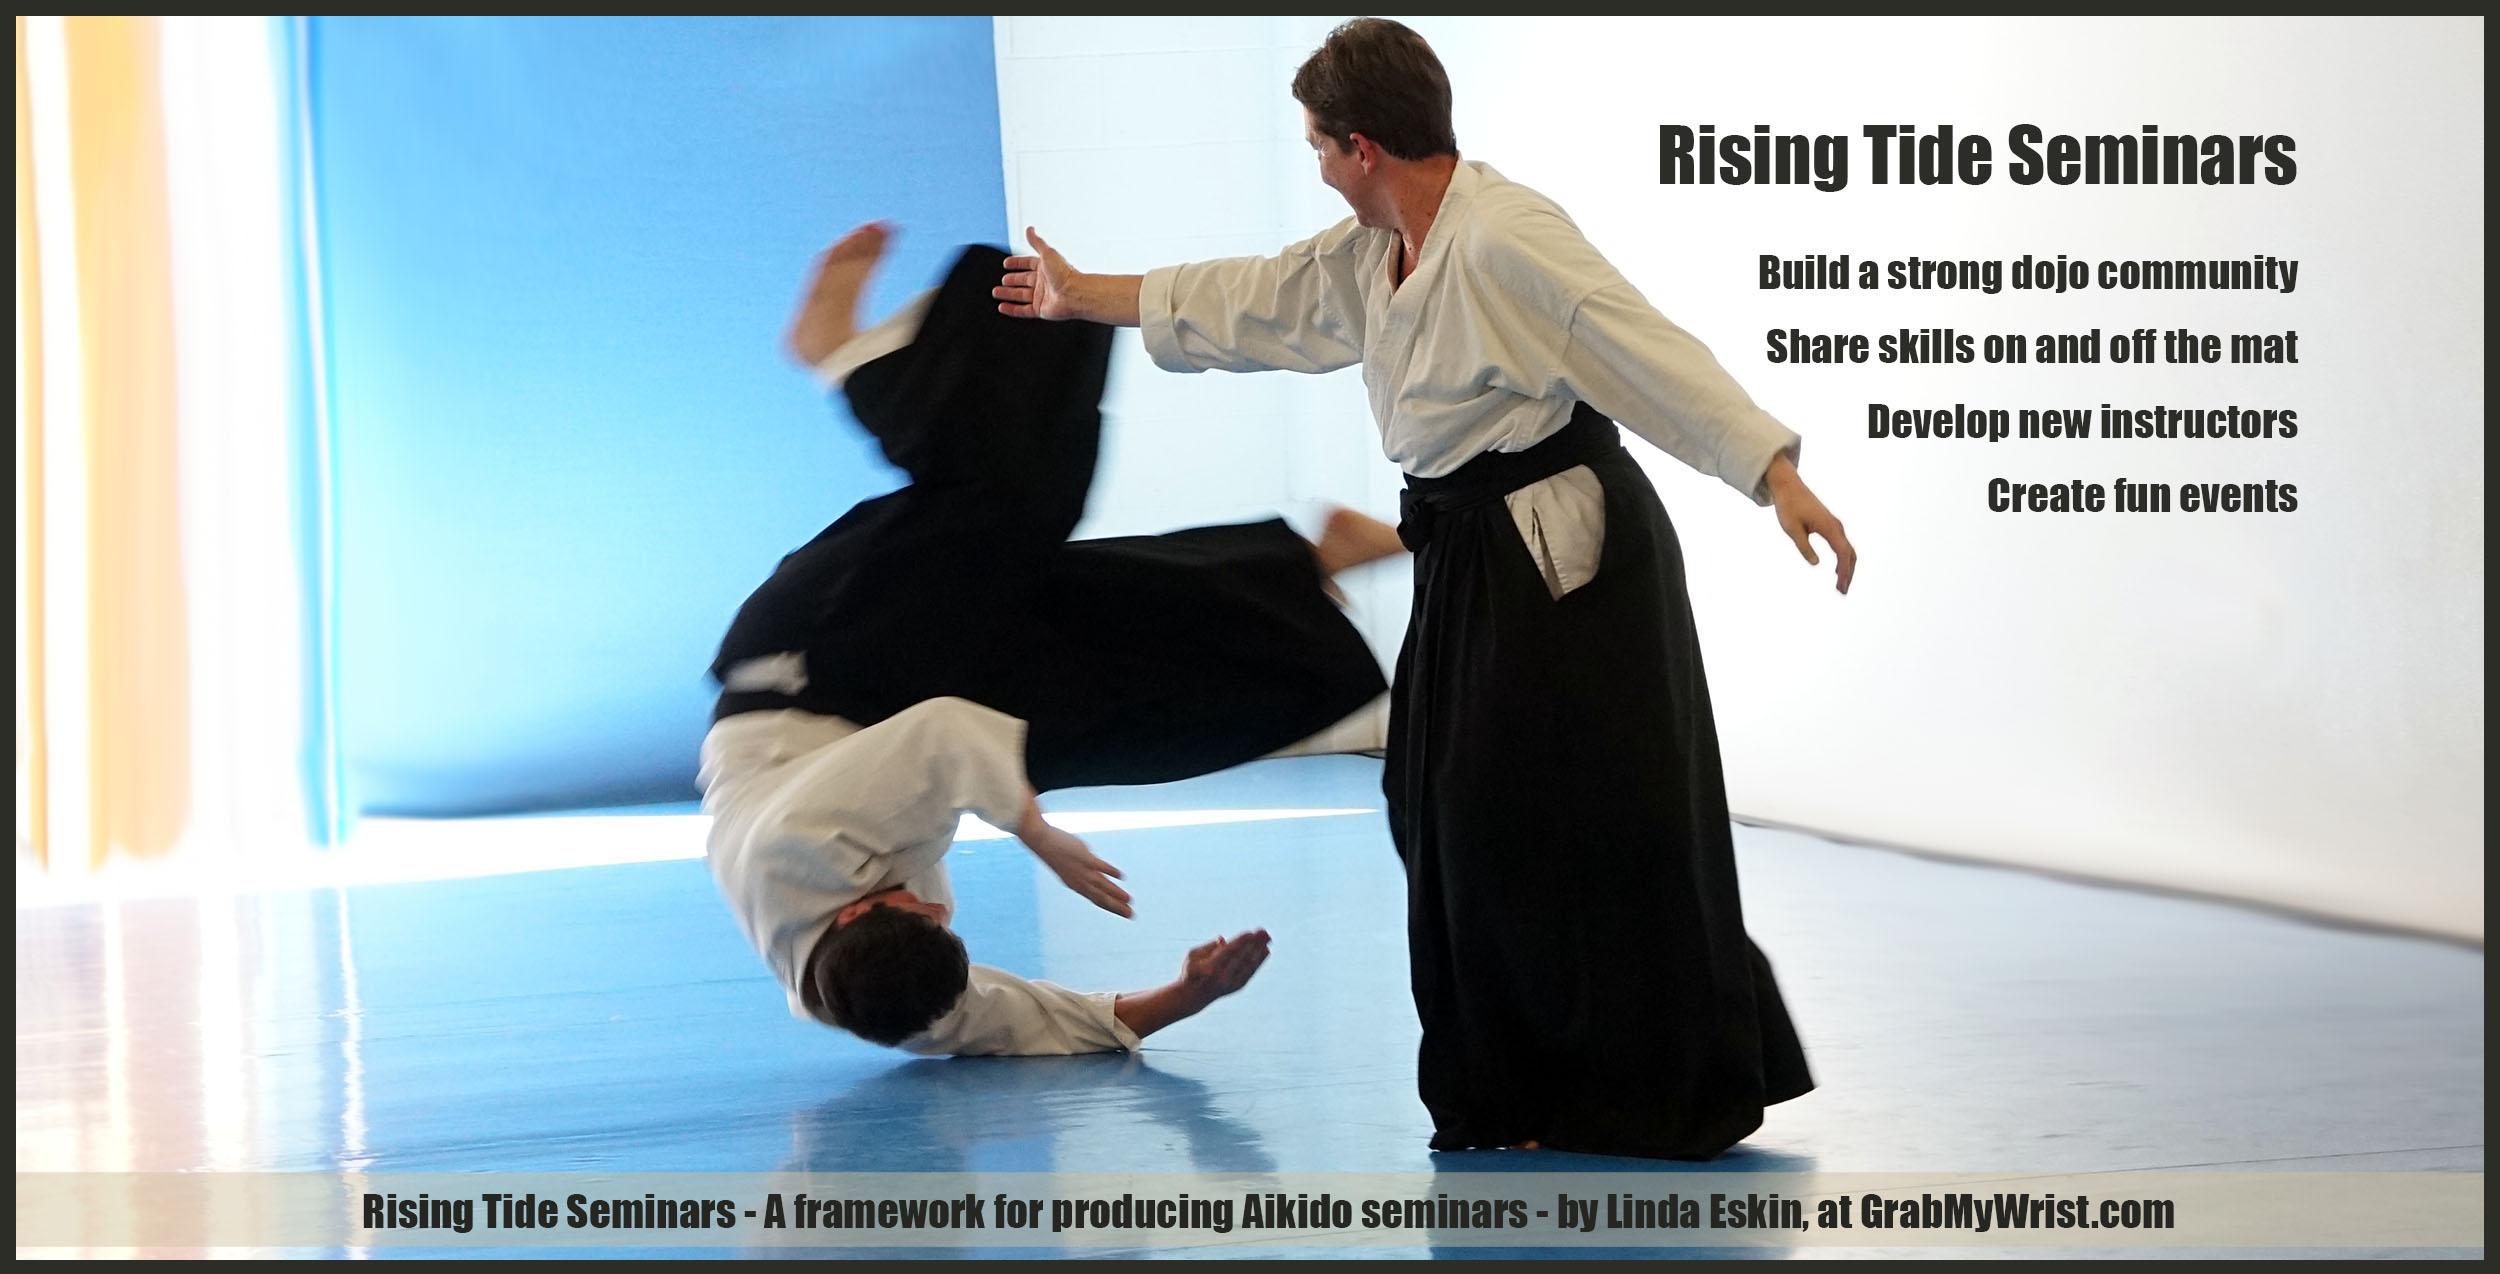 Rising Tide Seminars - A Framework for Growing Together by Producing Aikido Seminars